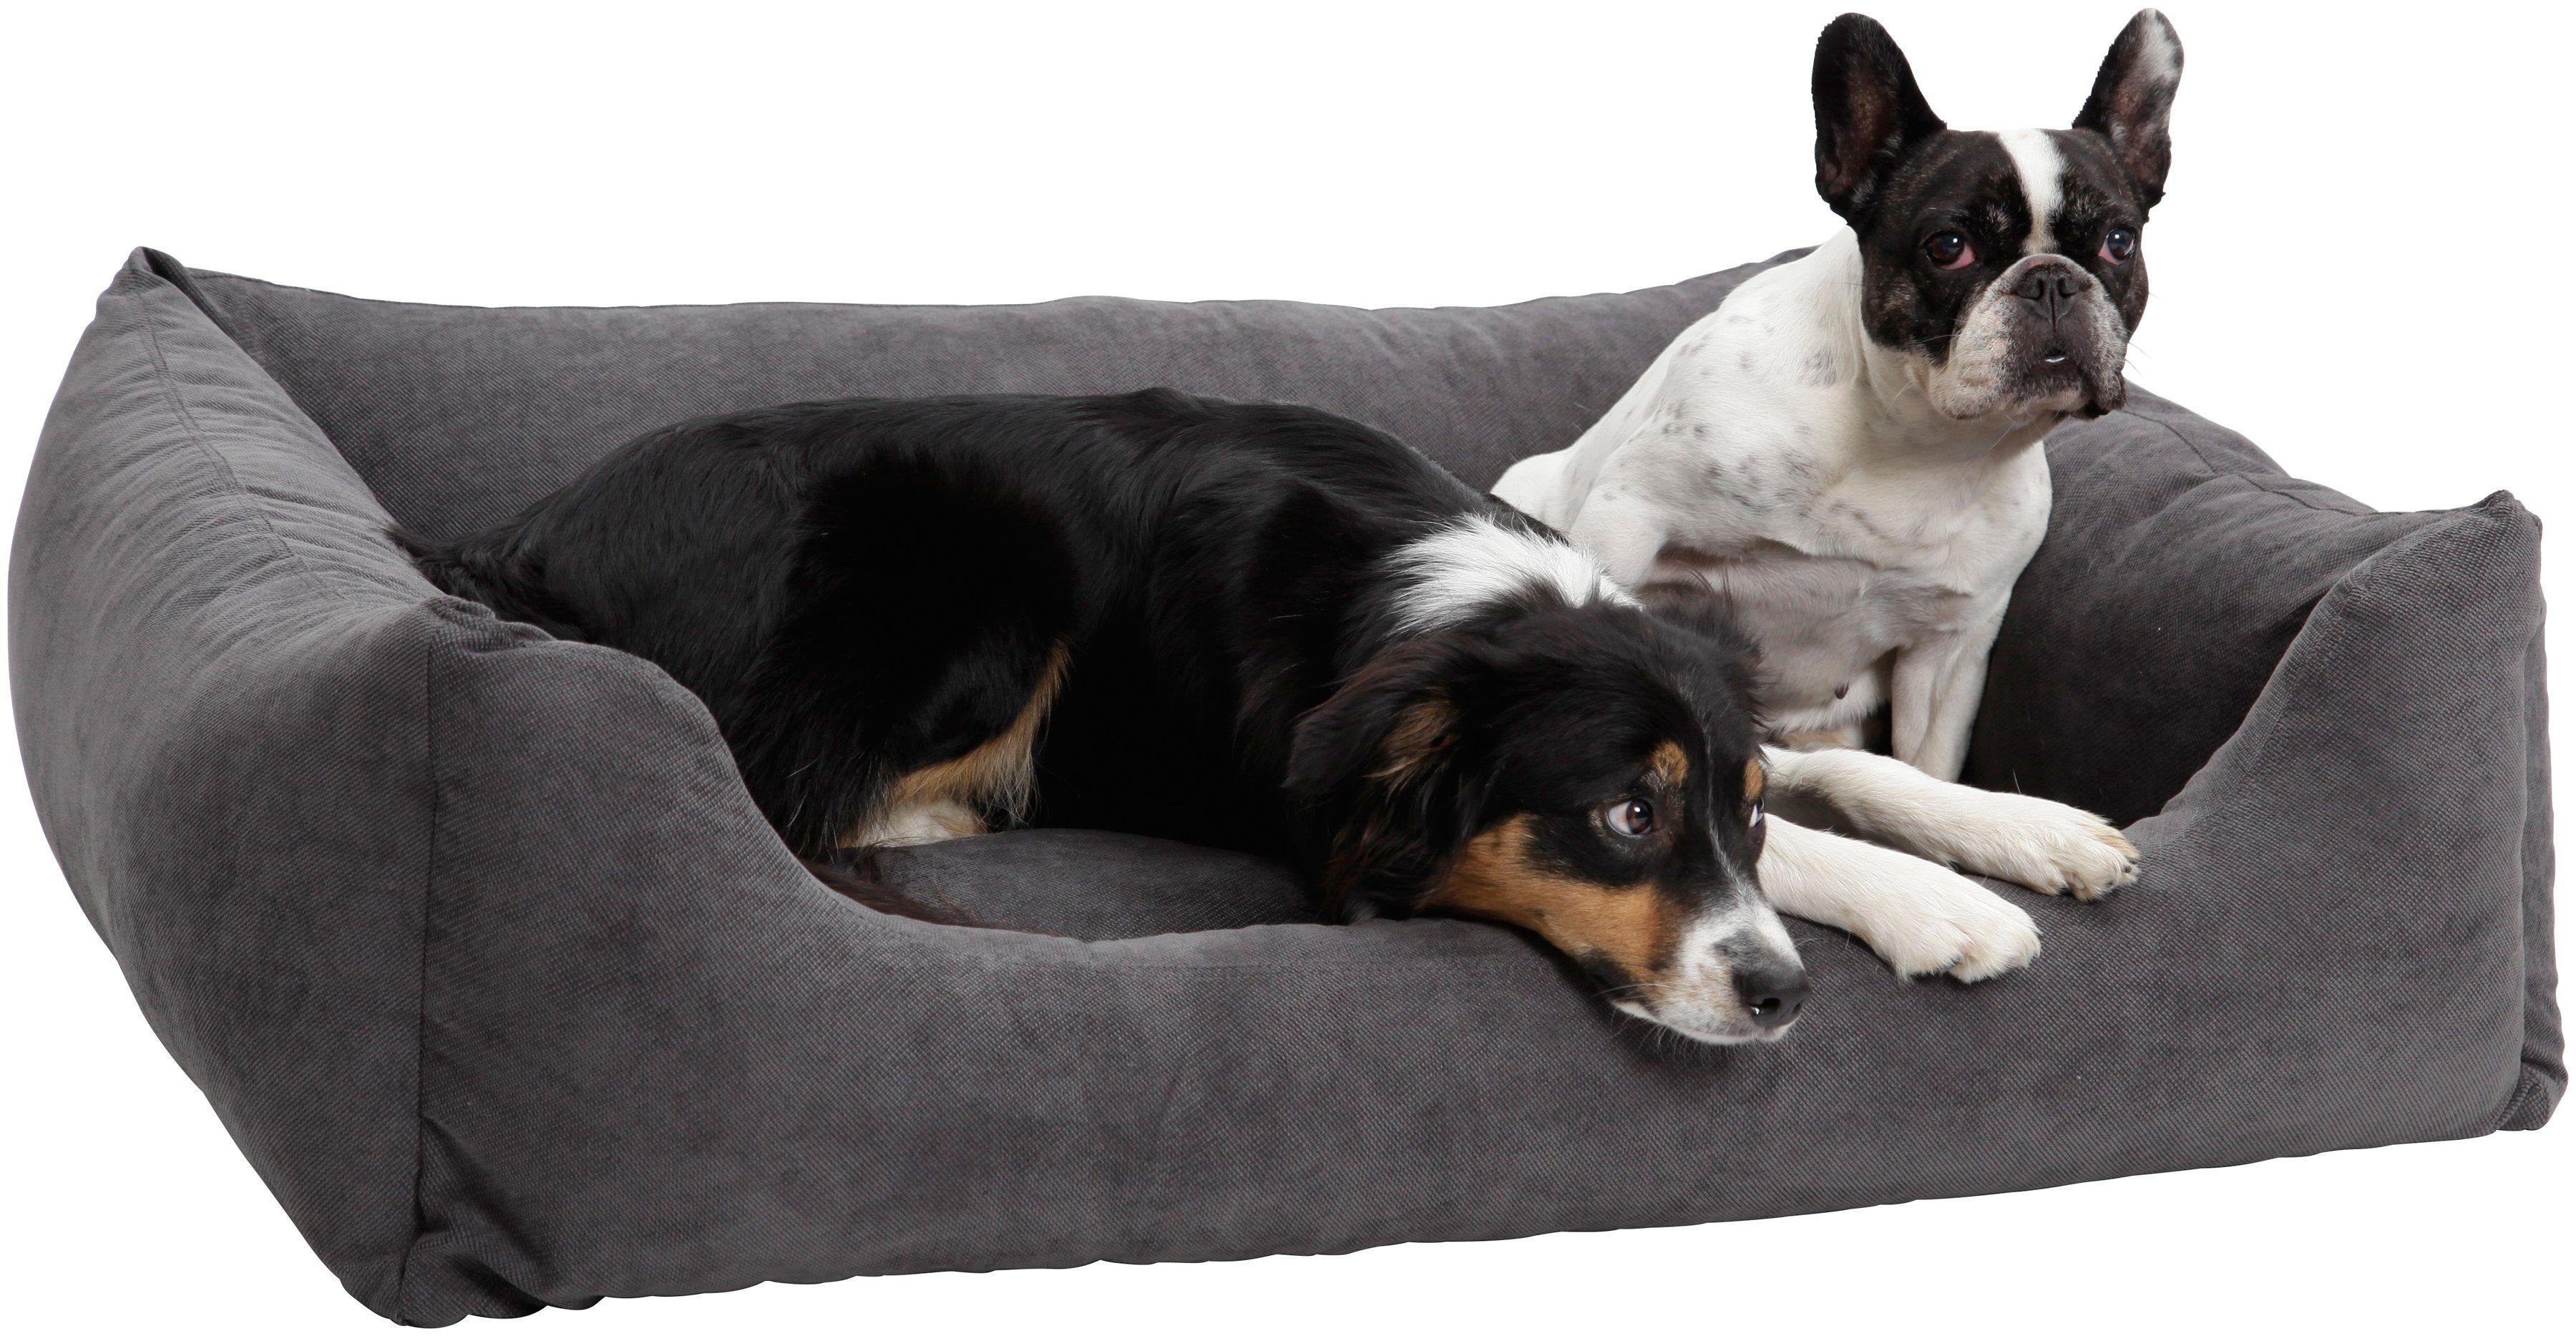 Hundebett und Katzenbett »Madison«, B/T/H: 90/70/30 cm, Anthrazit